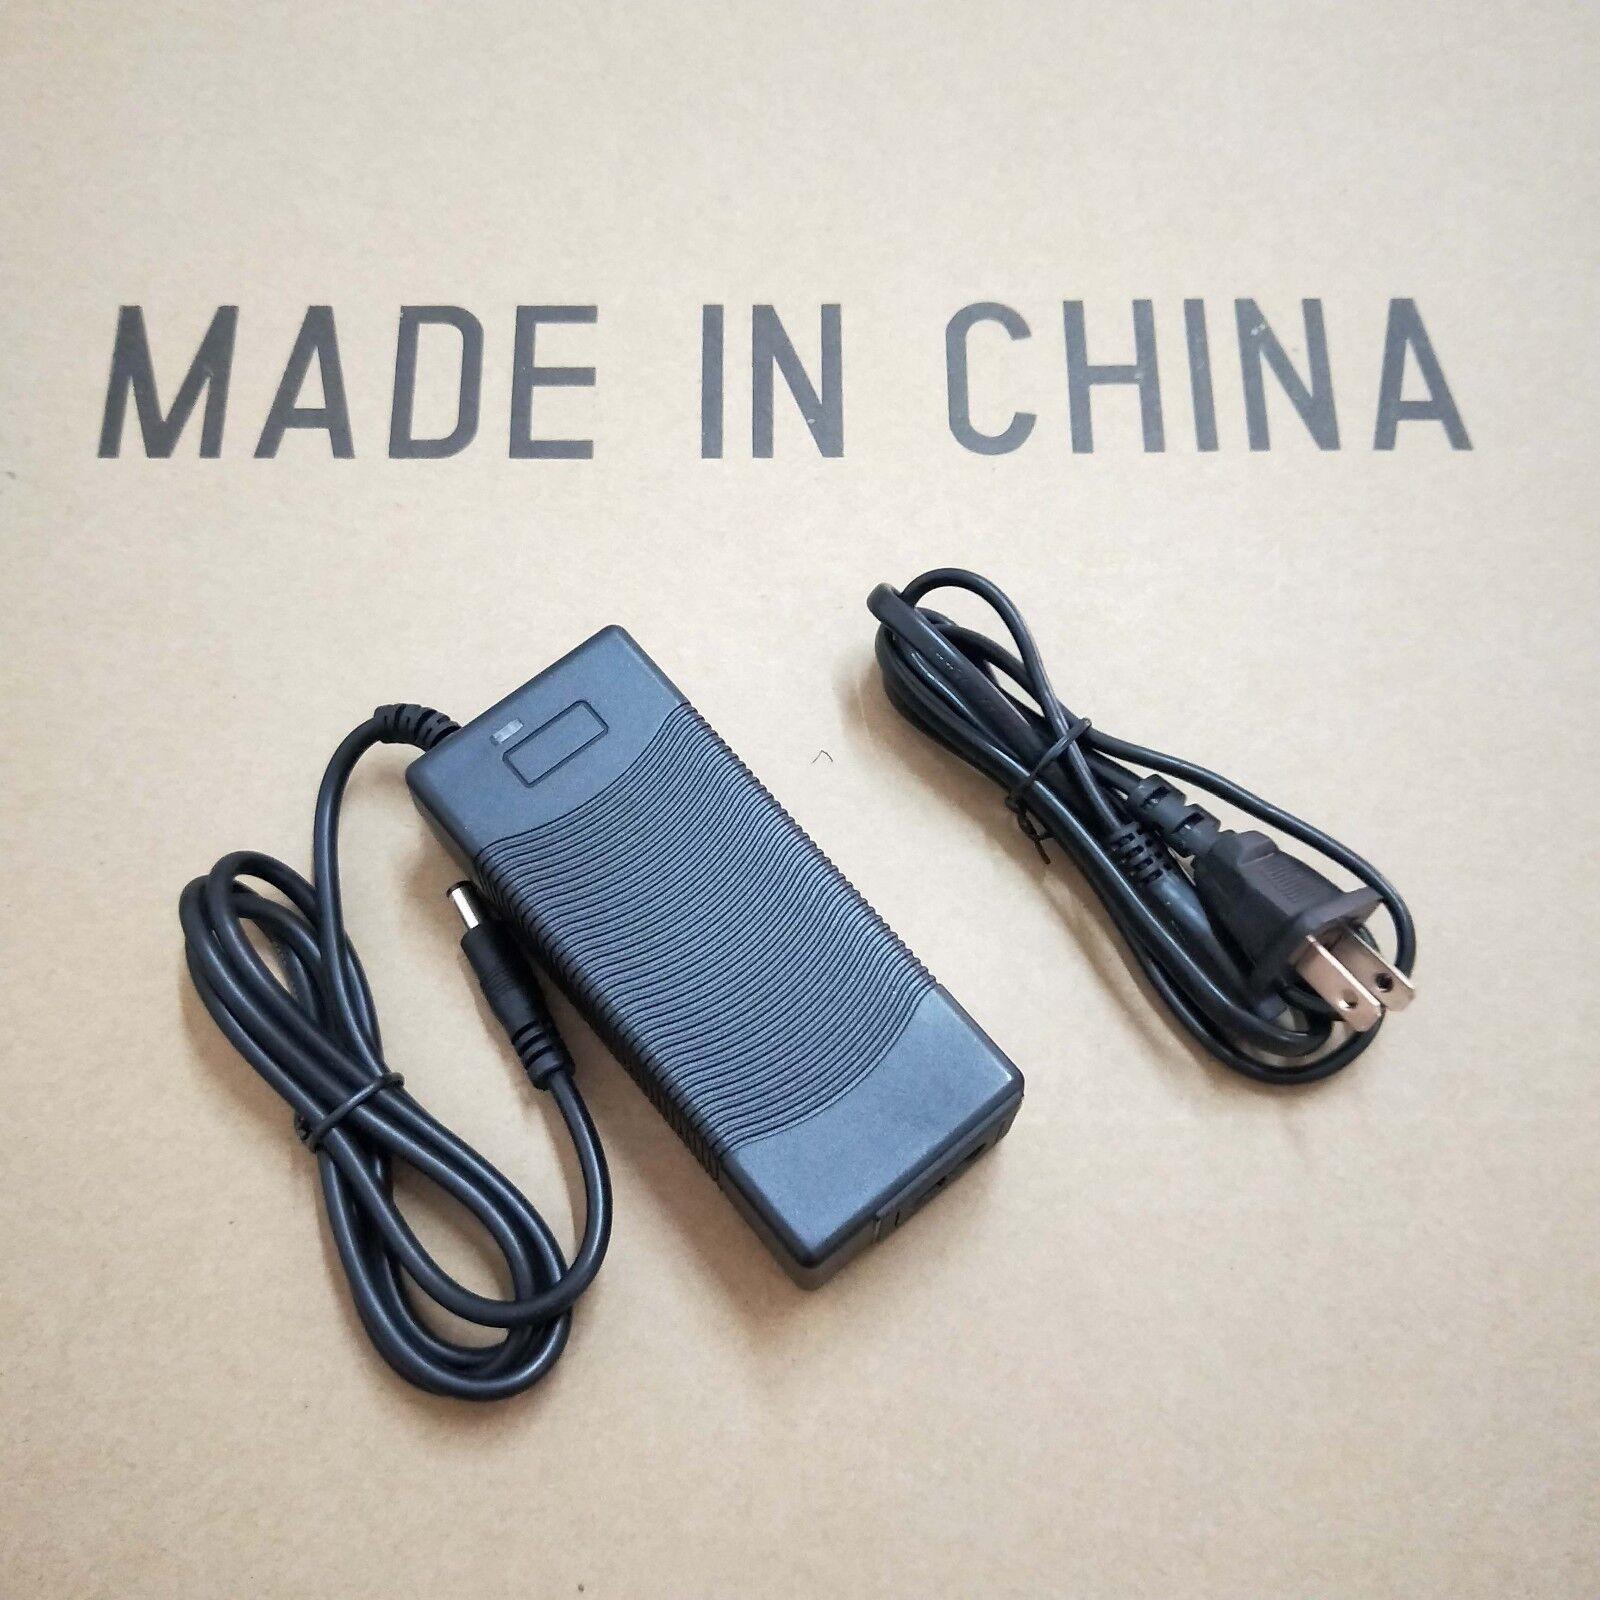 Smart Battery charger  36V 2A 42V 2A 10S Li-ion charger with 2.1DC plug 110-220V  deals sale